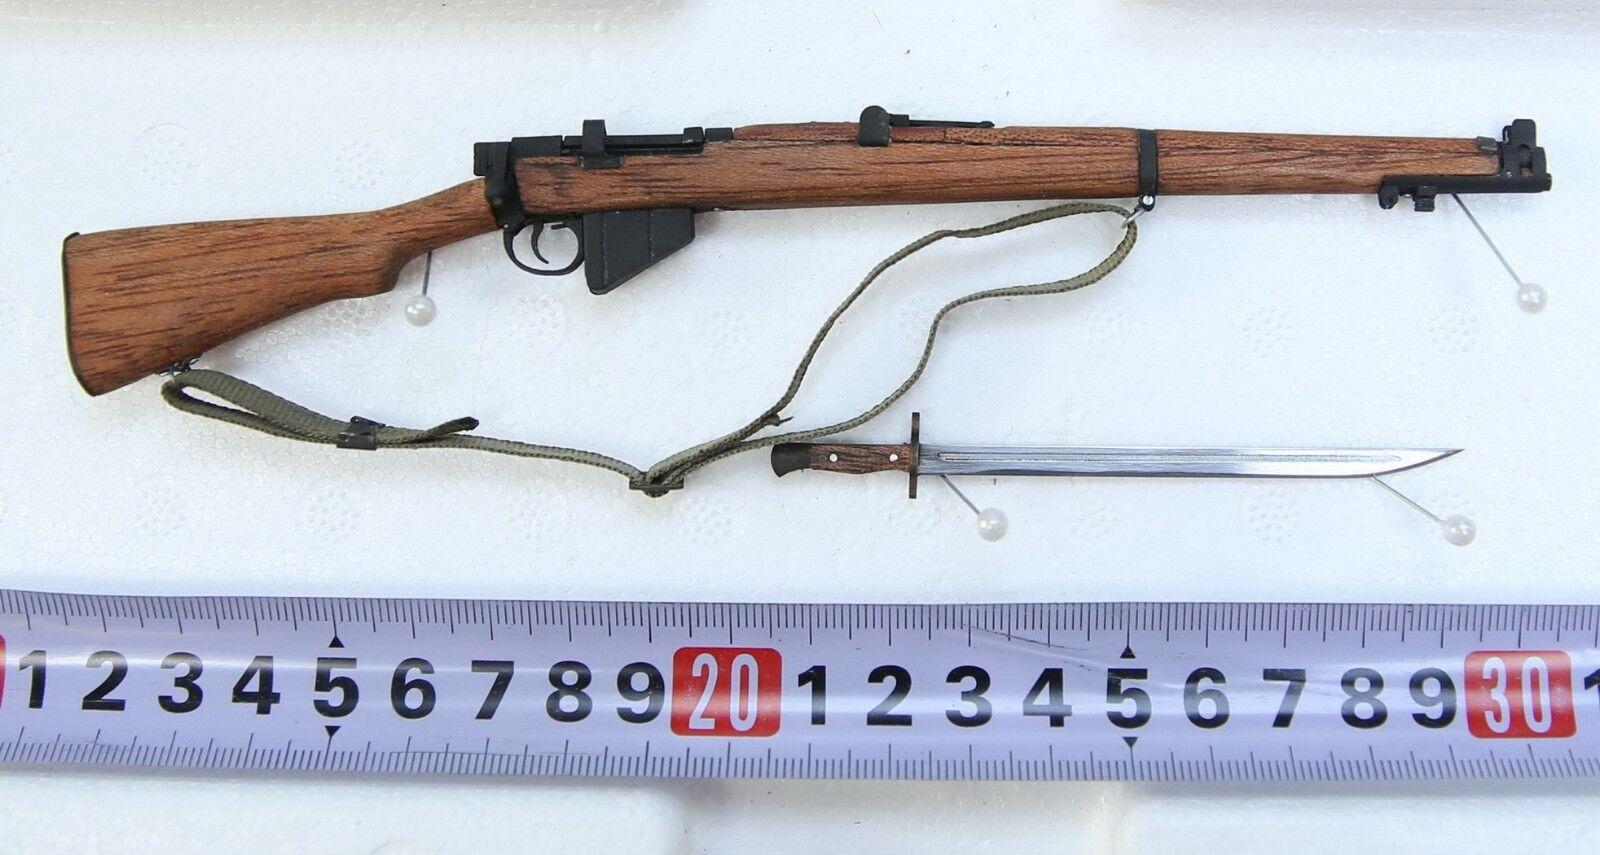 TI-LITE 1 6 Scale WWII British Lee-Enfield Mk III Wood & Metal Rifle w  Bayonet